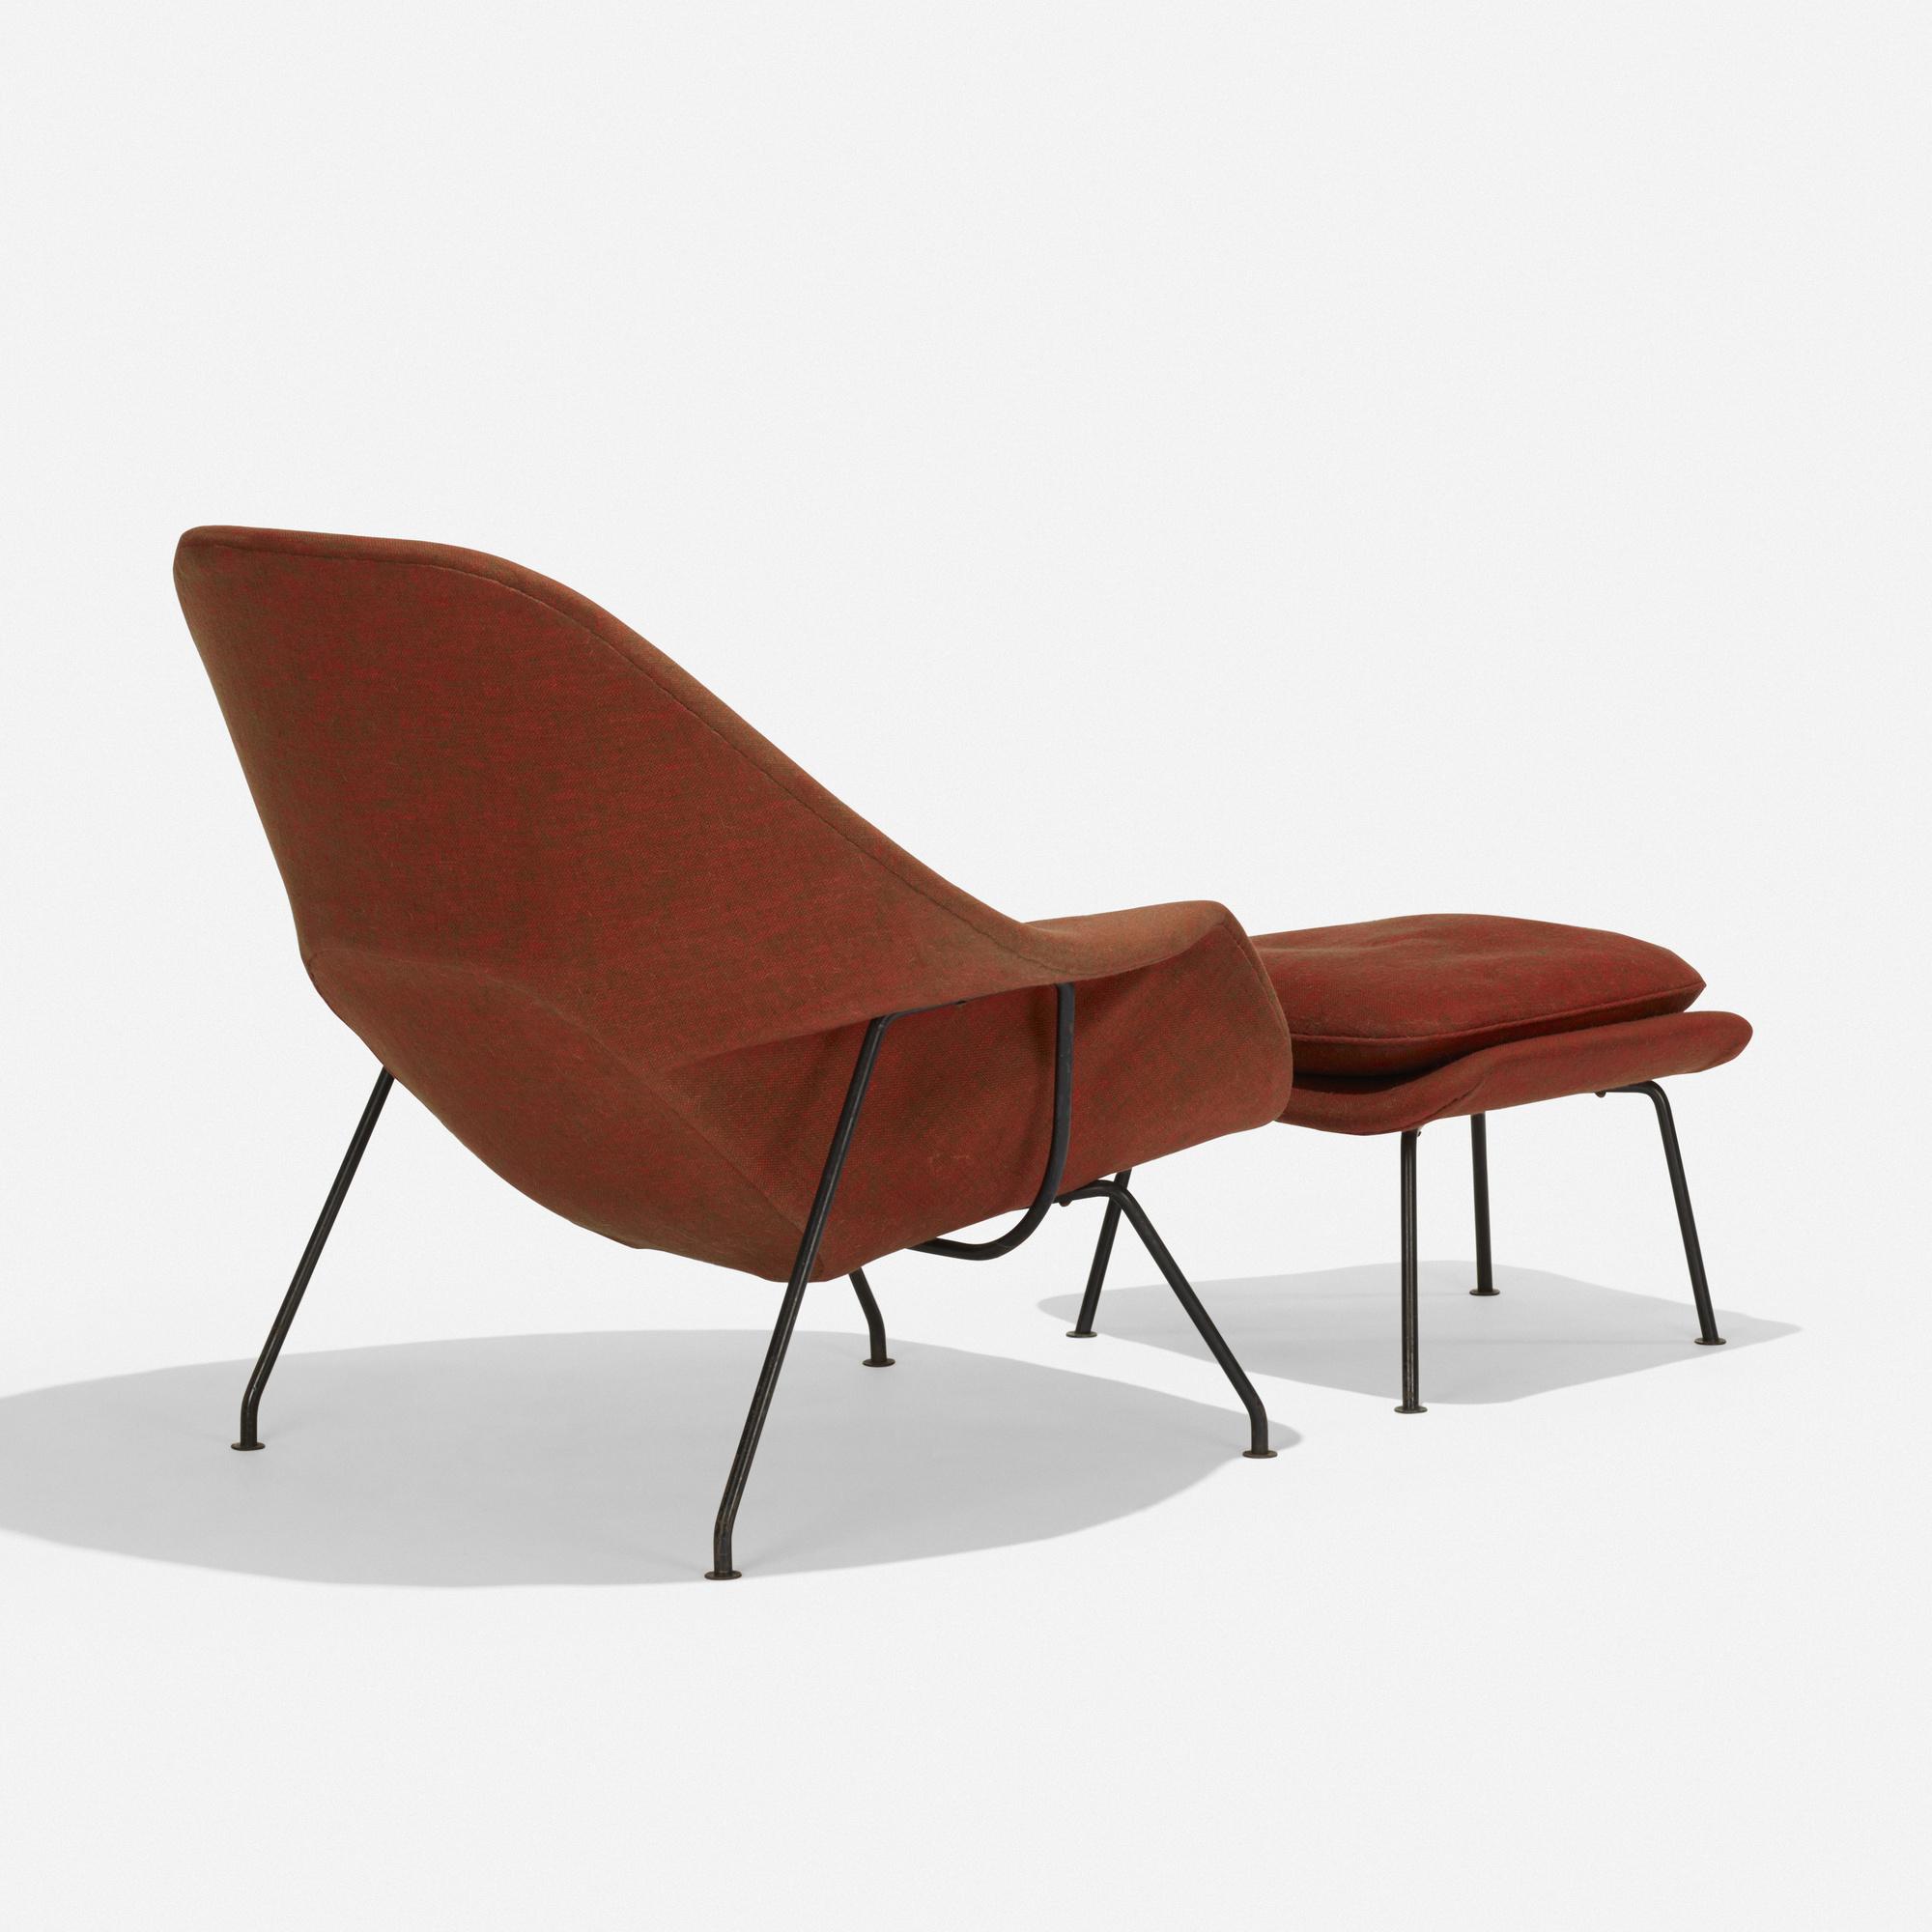 151 Eero Saarinen Womb Chair And Ottoman American Design 21